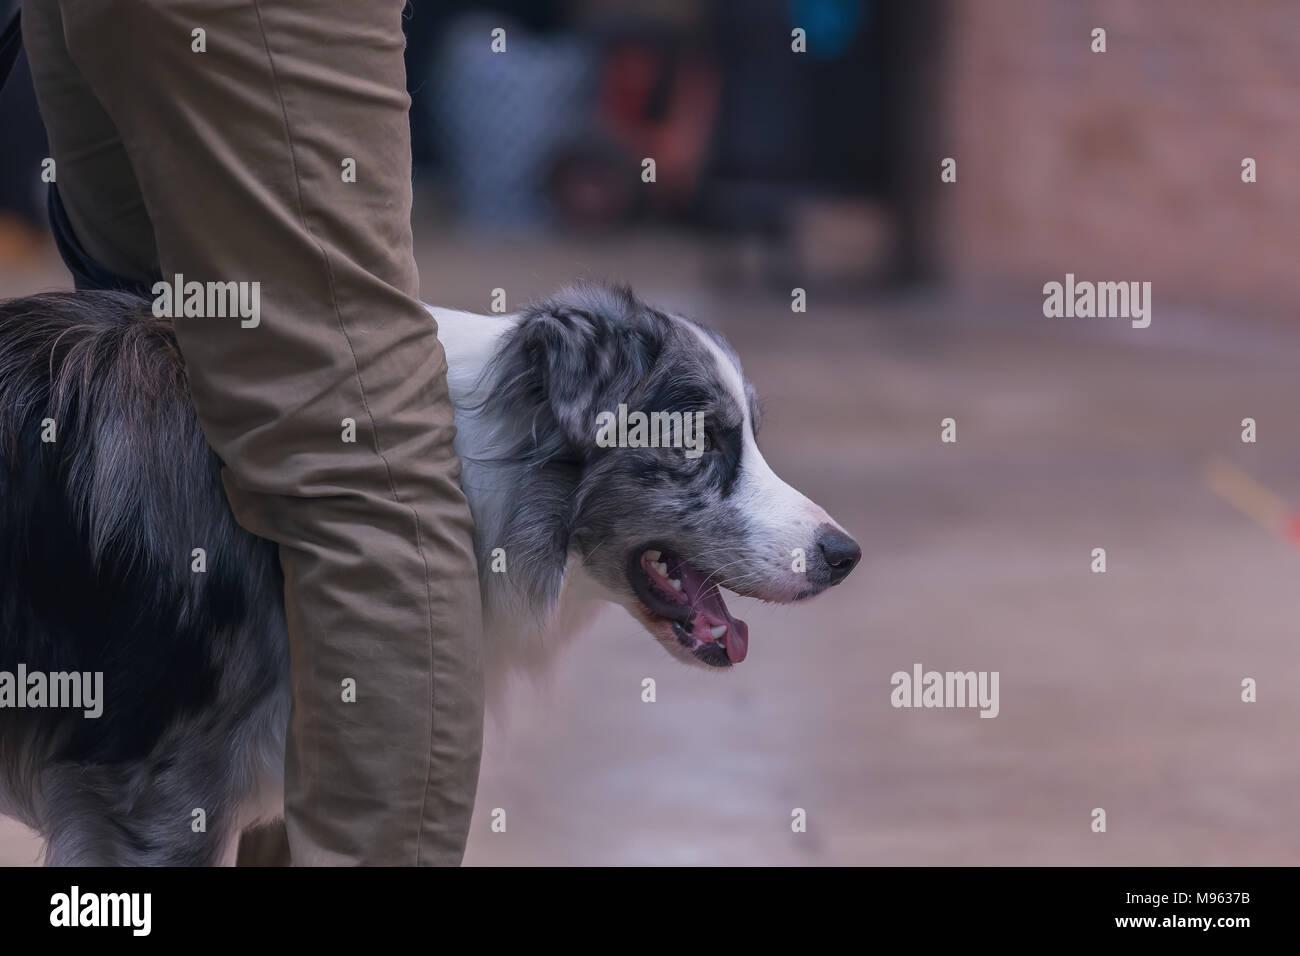 22th INTERNATIONAL DOG SHOW GIRONA March 17, 2018,Spain, Blue Merle Border Collie Stock Photo